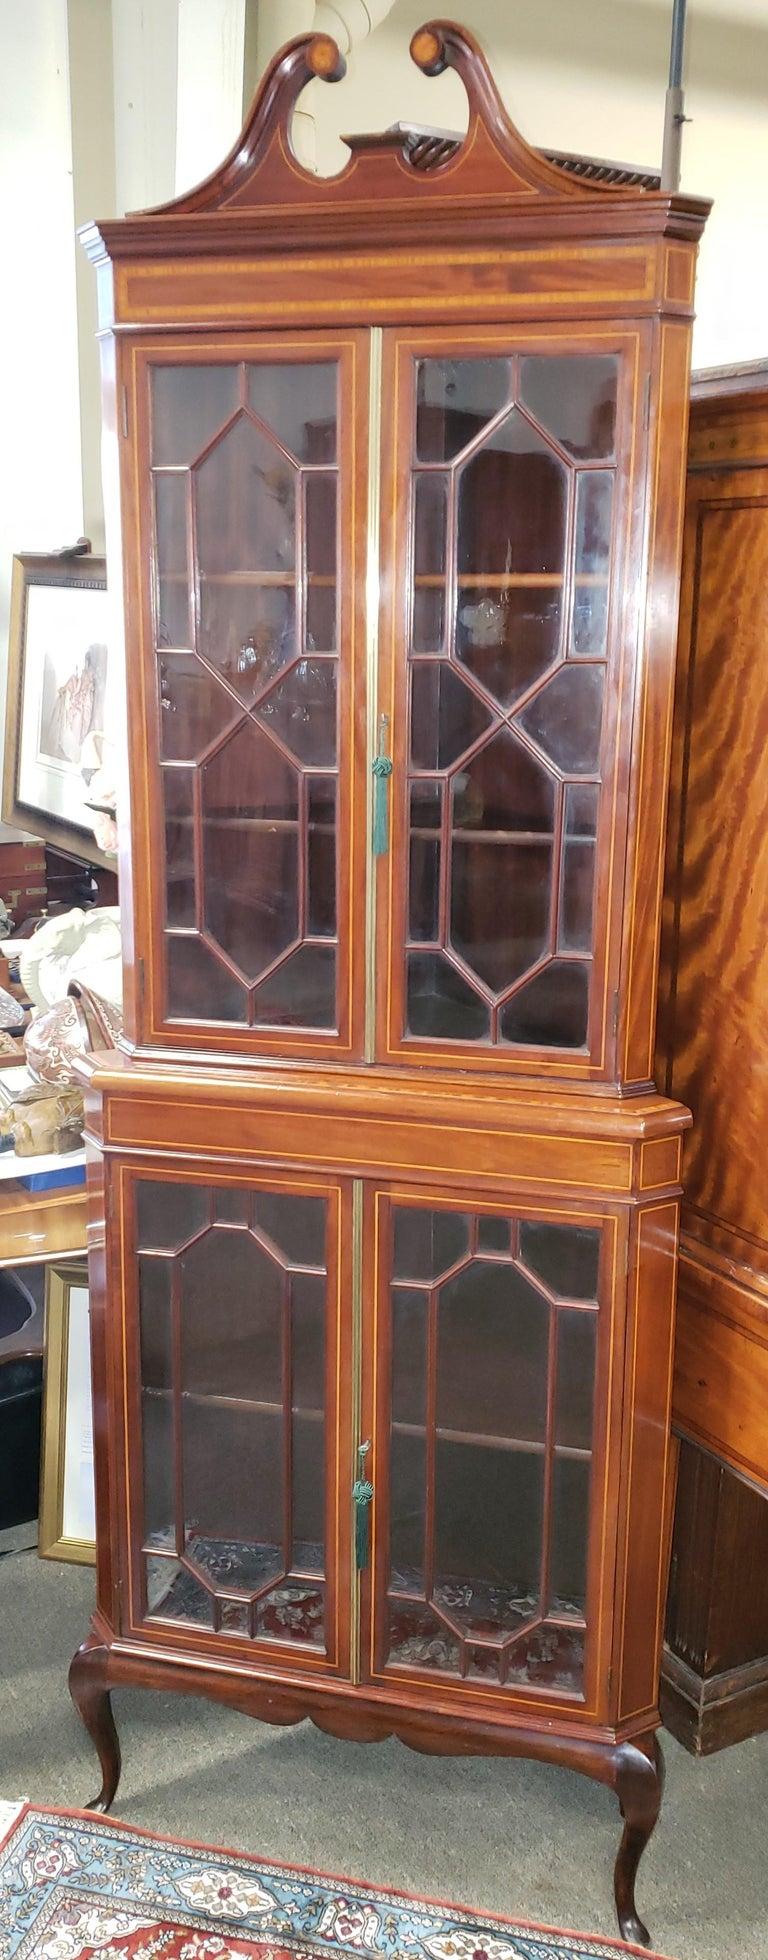 Victorian Mahogany Corner Cabinet For Sale at 1stdibs